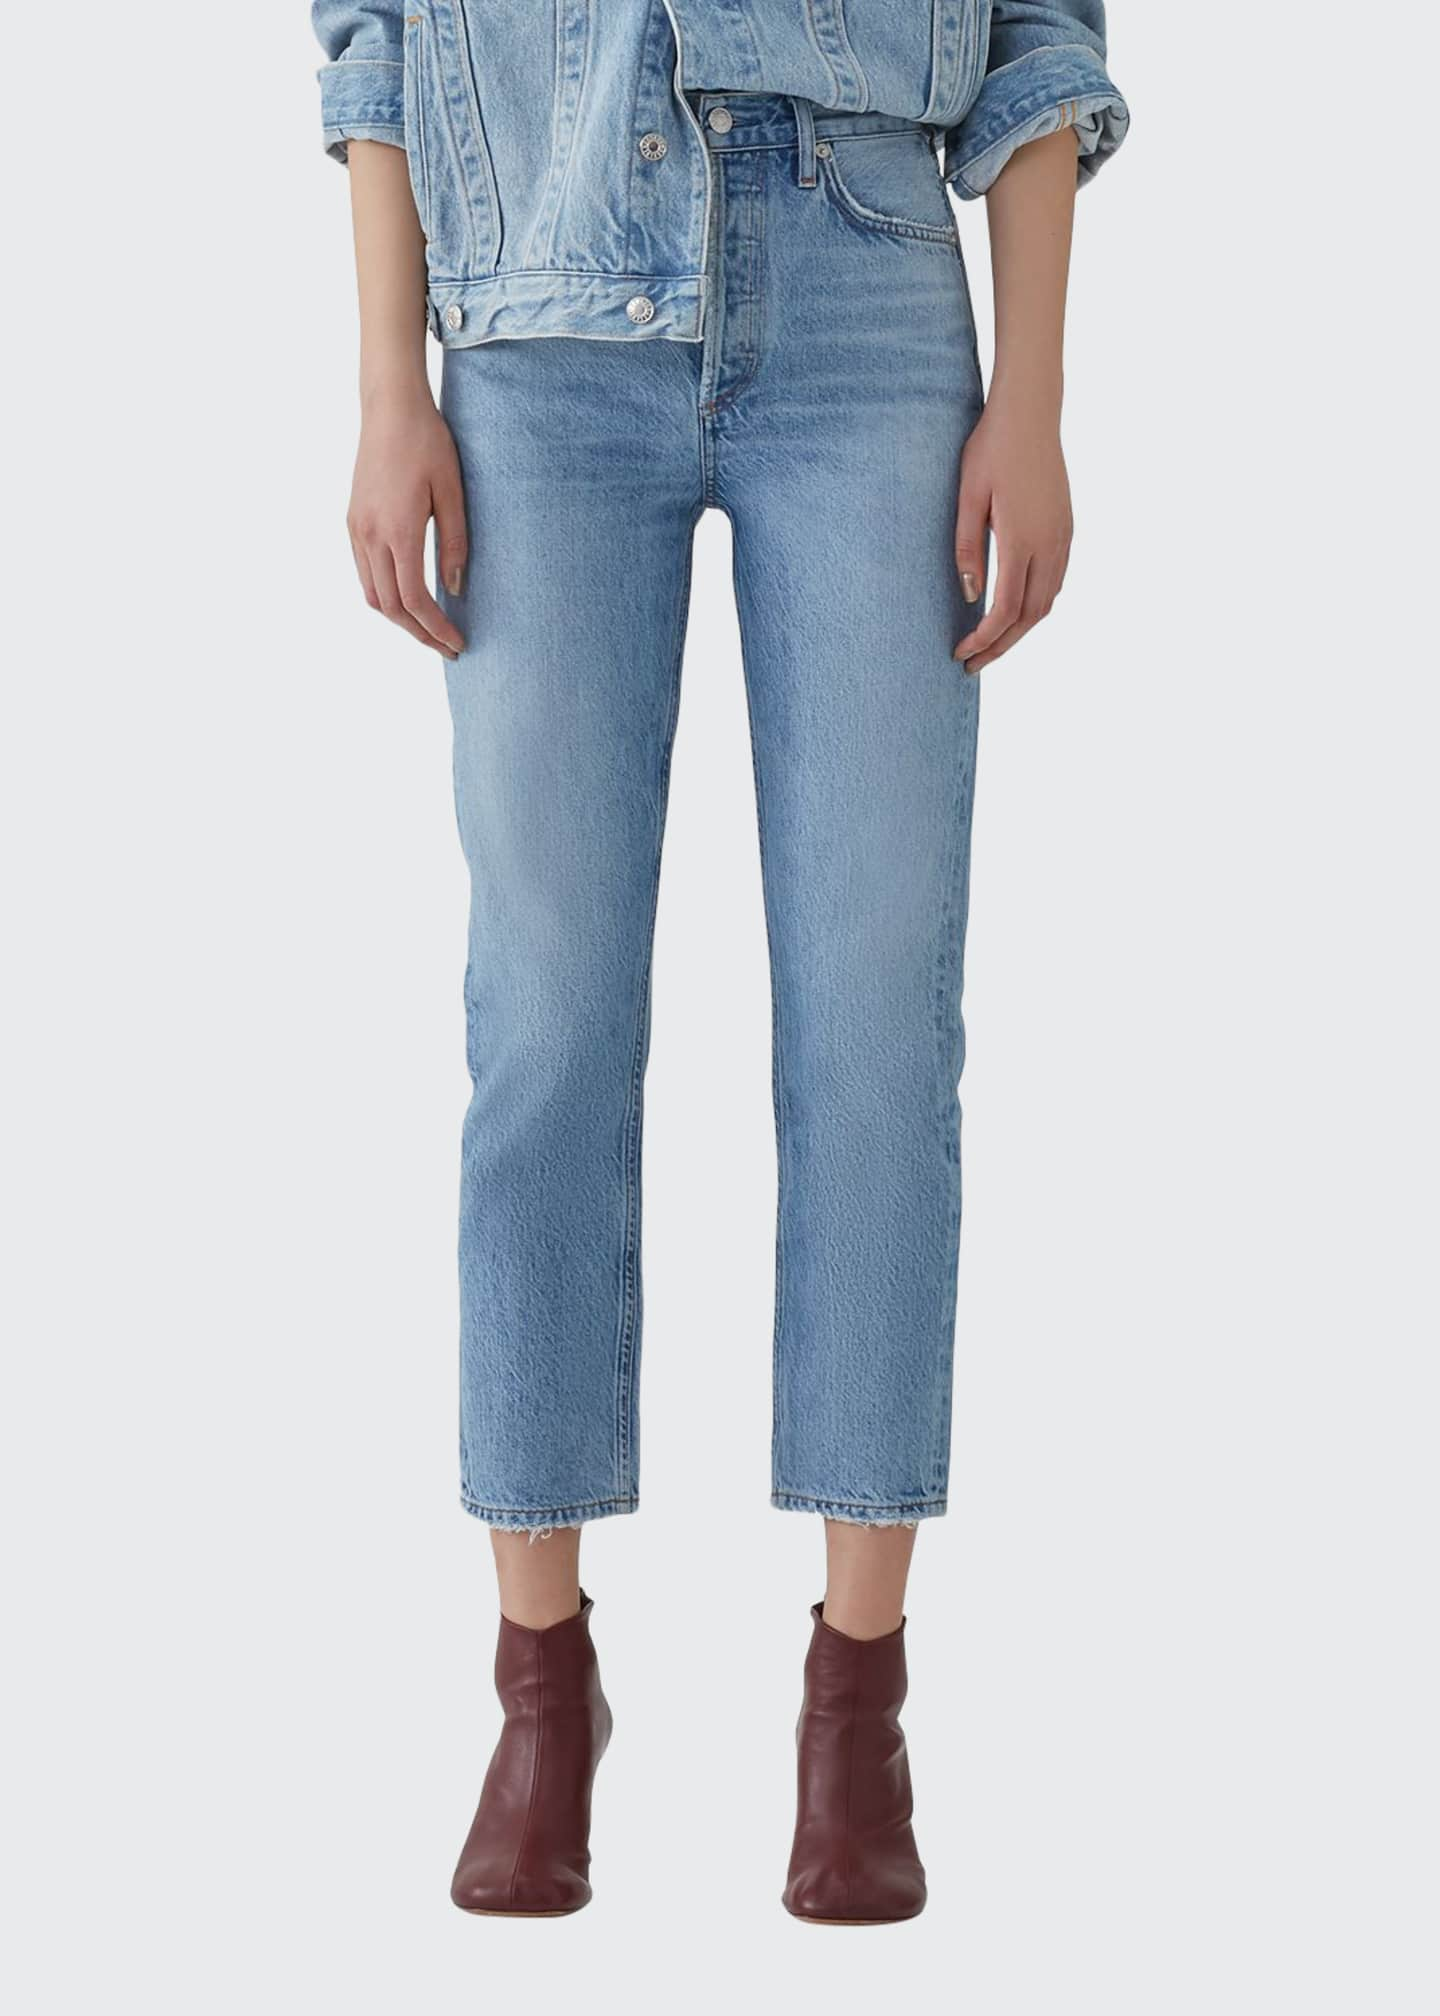 AGOLDE Riley Crop High-Rise Straight Organic Denim Jeans